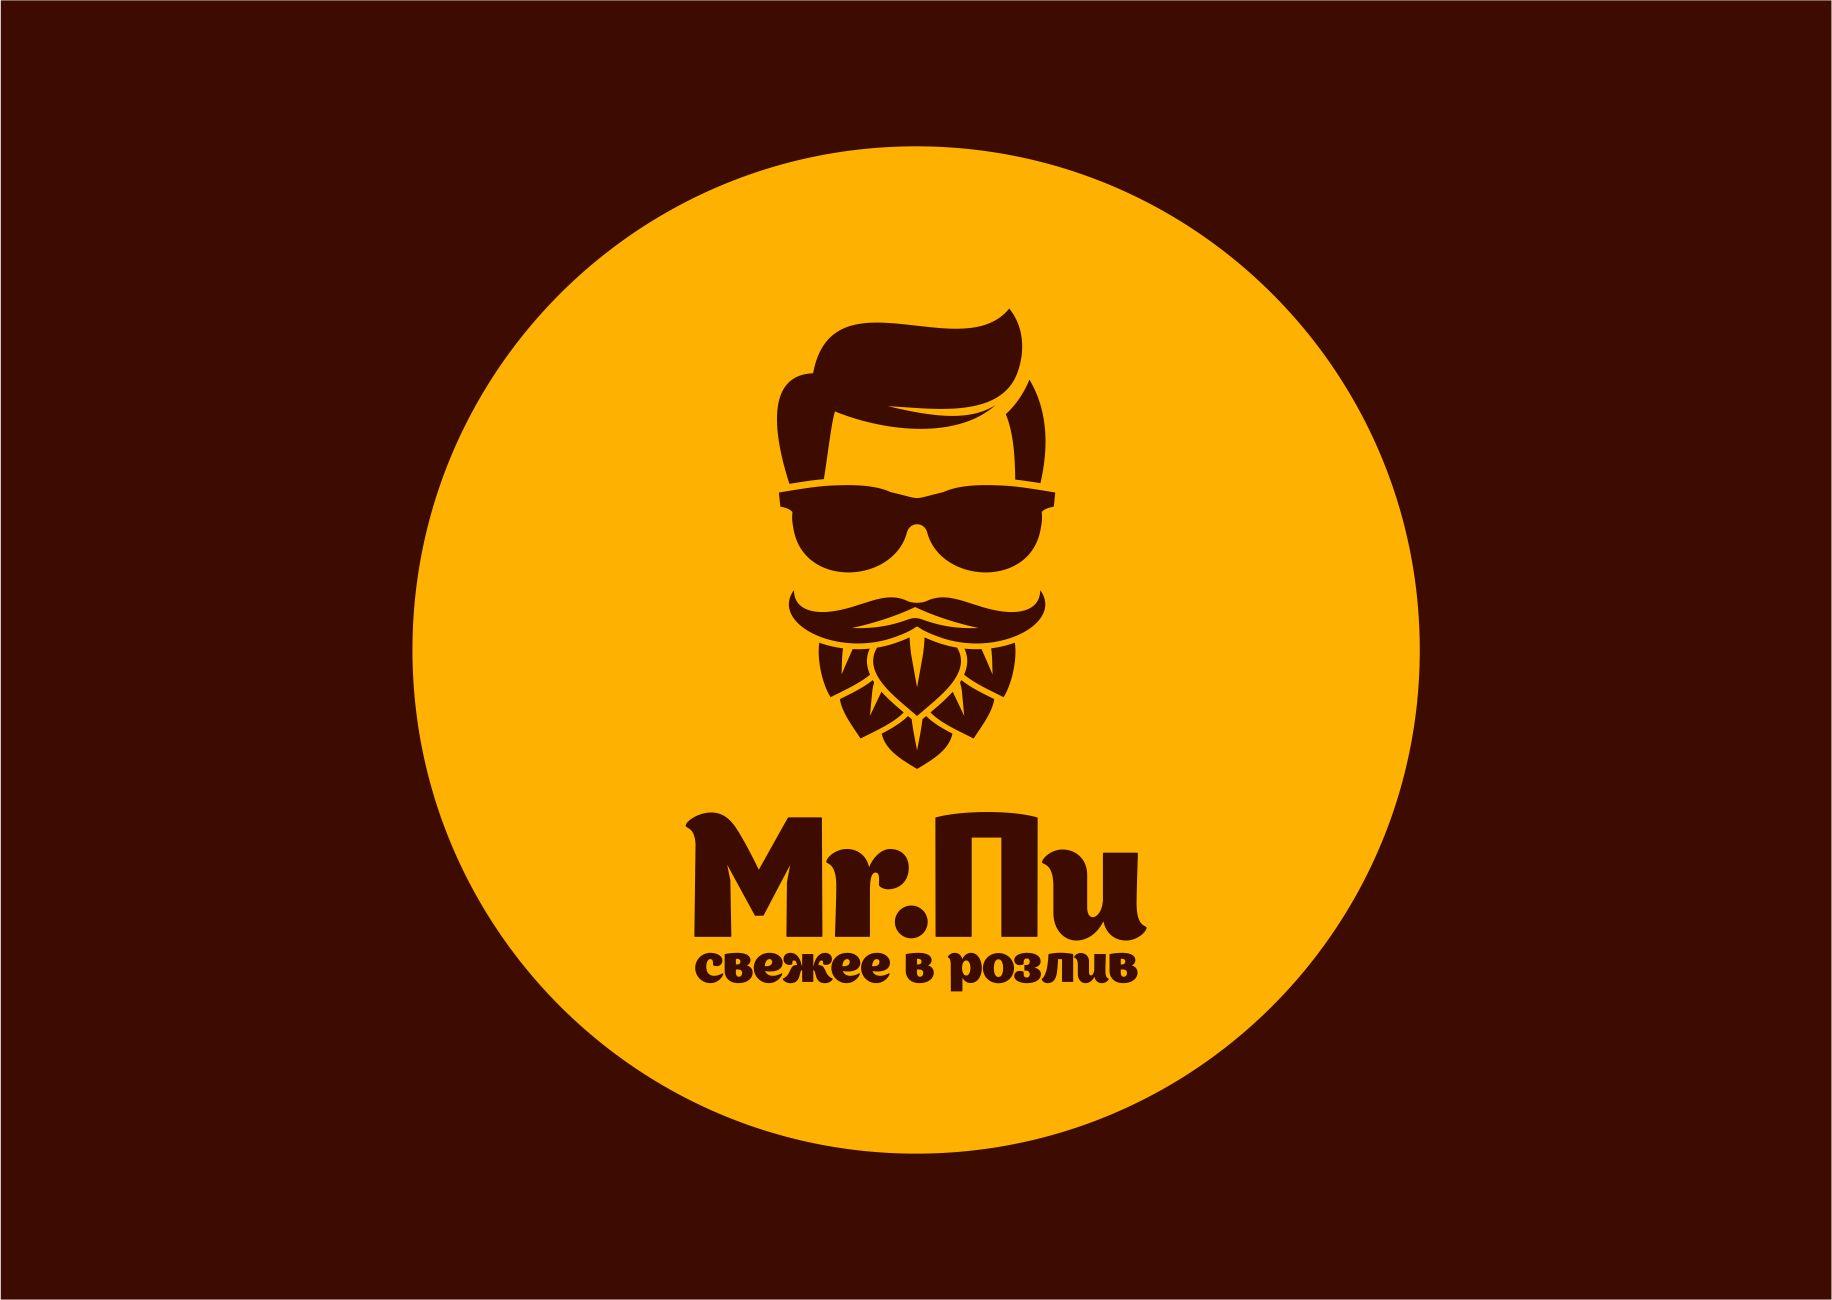 конкурс 1 место Логотип для разливного пива